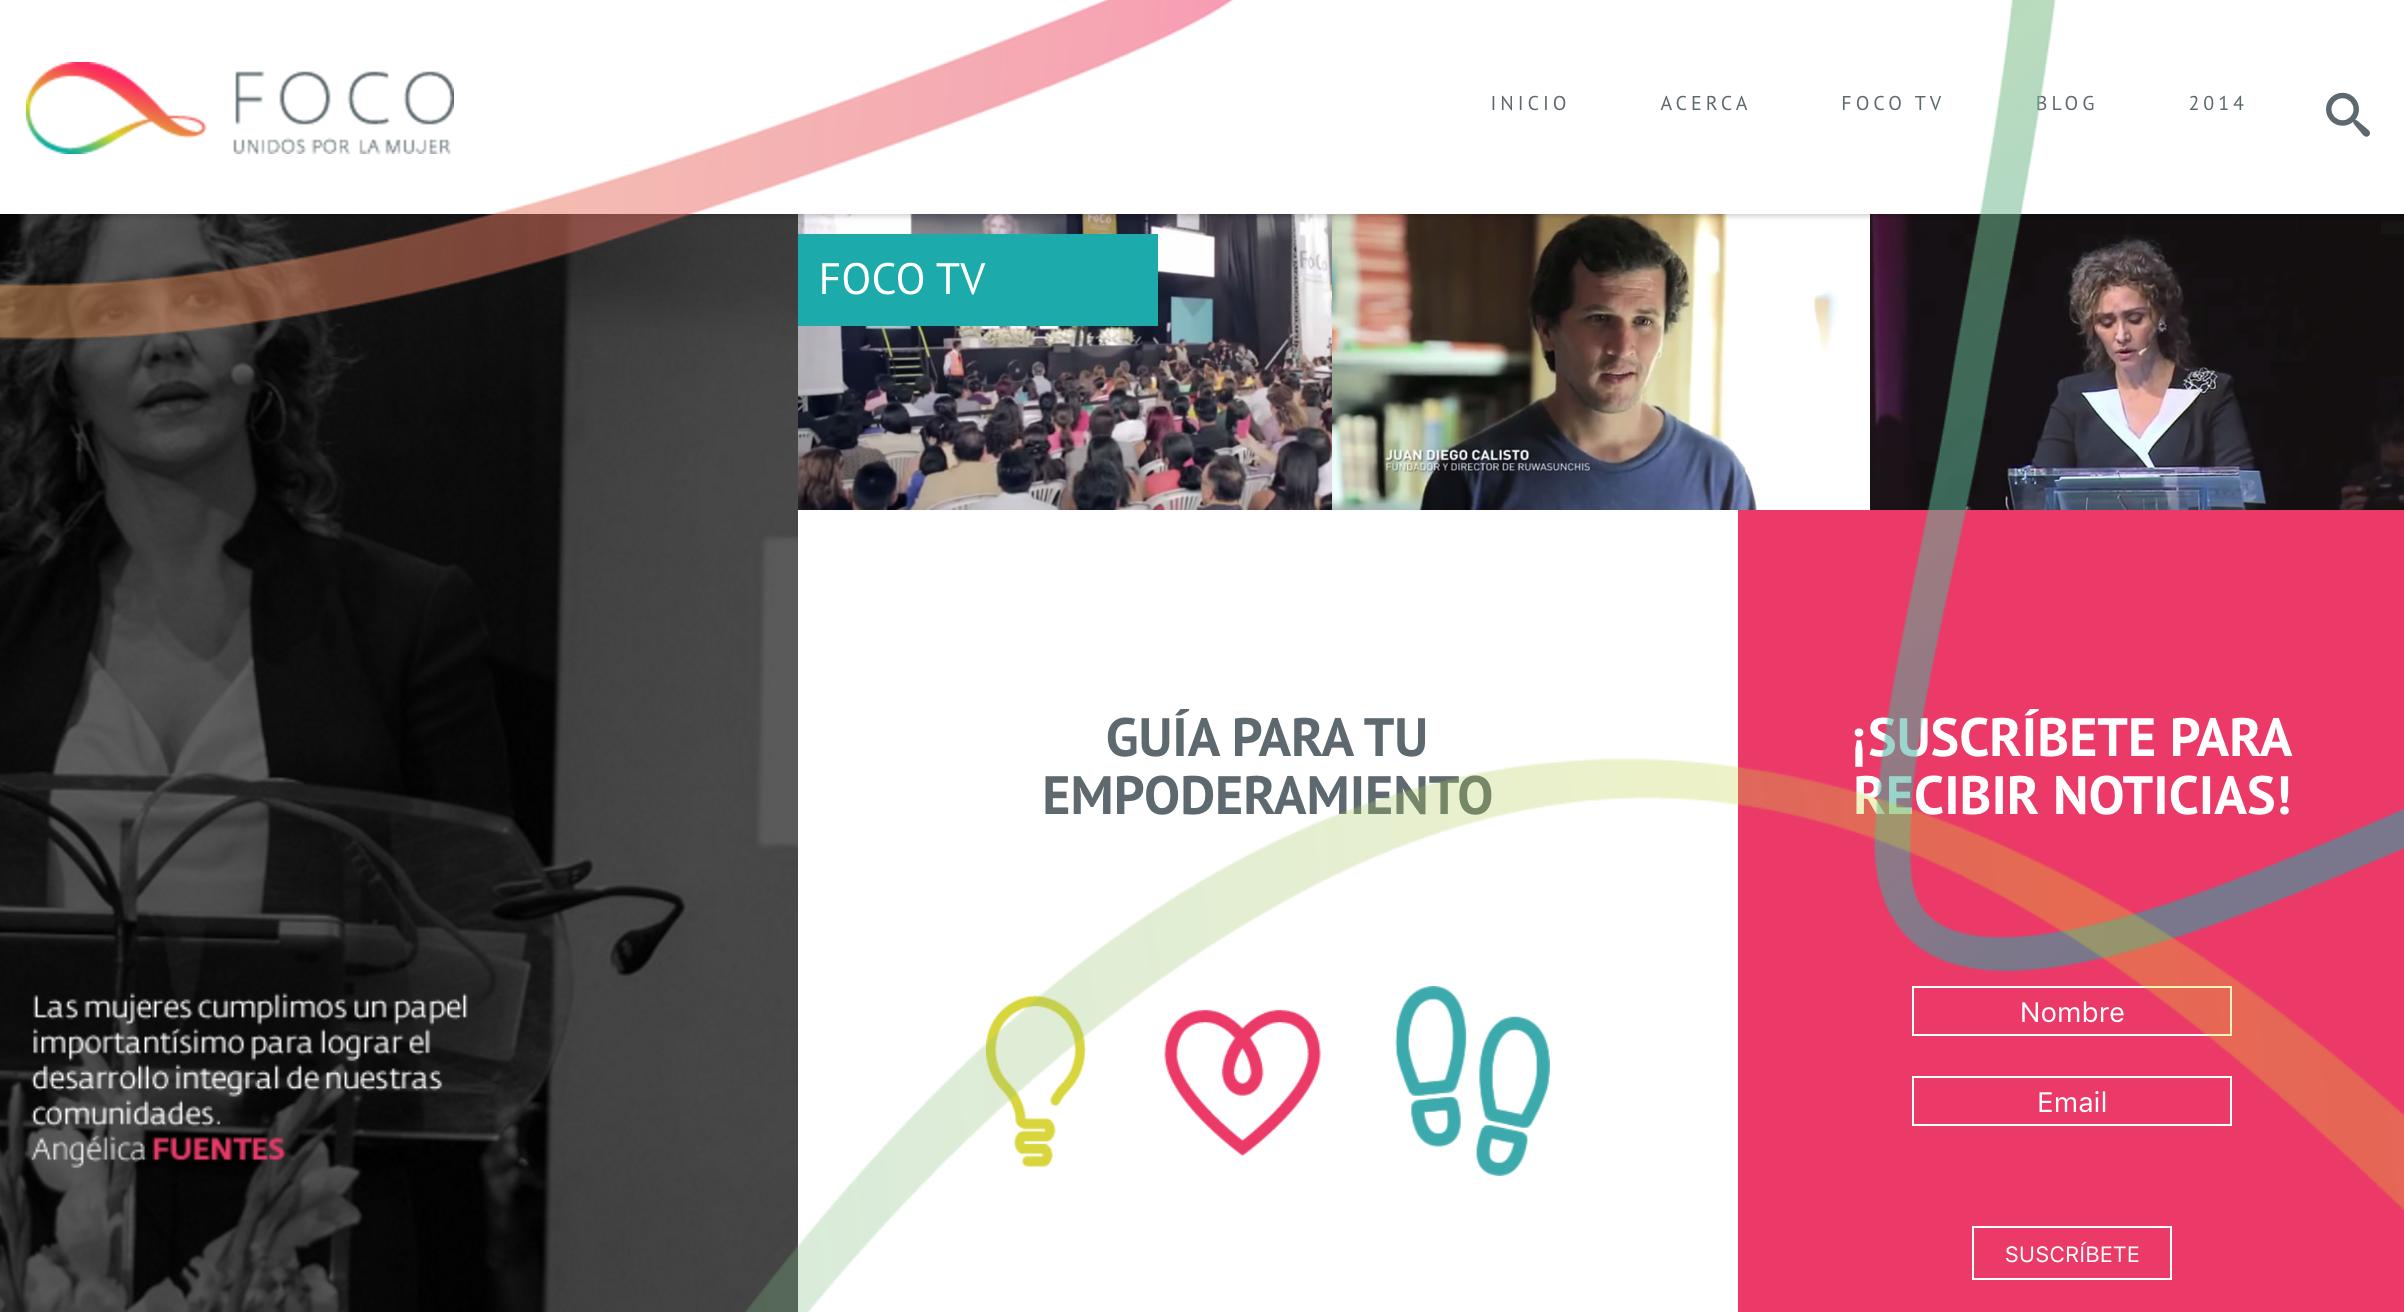 event website design angelica fuentes